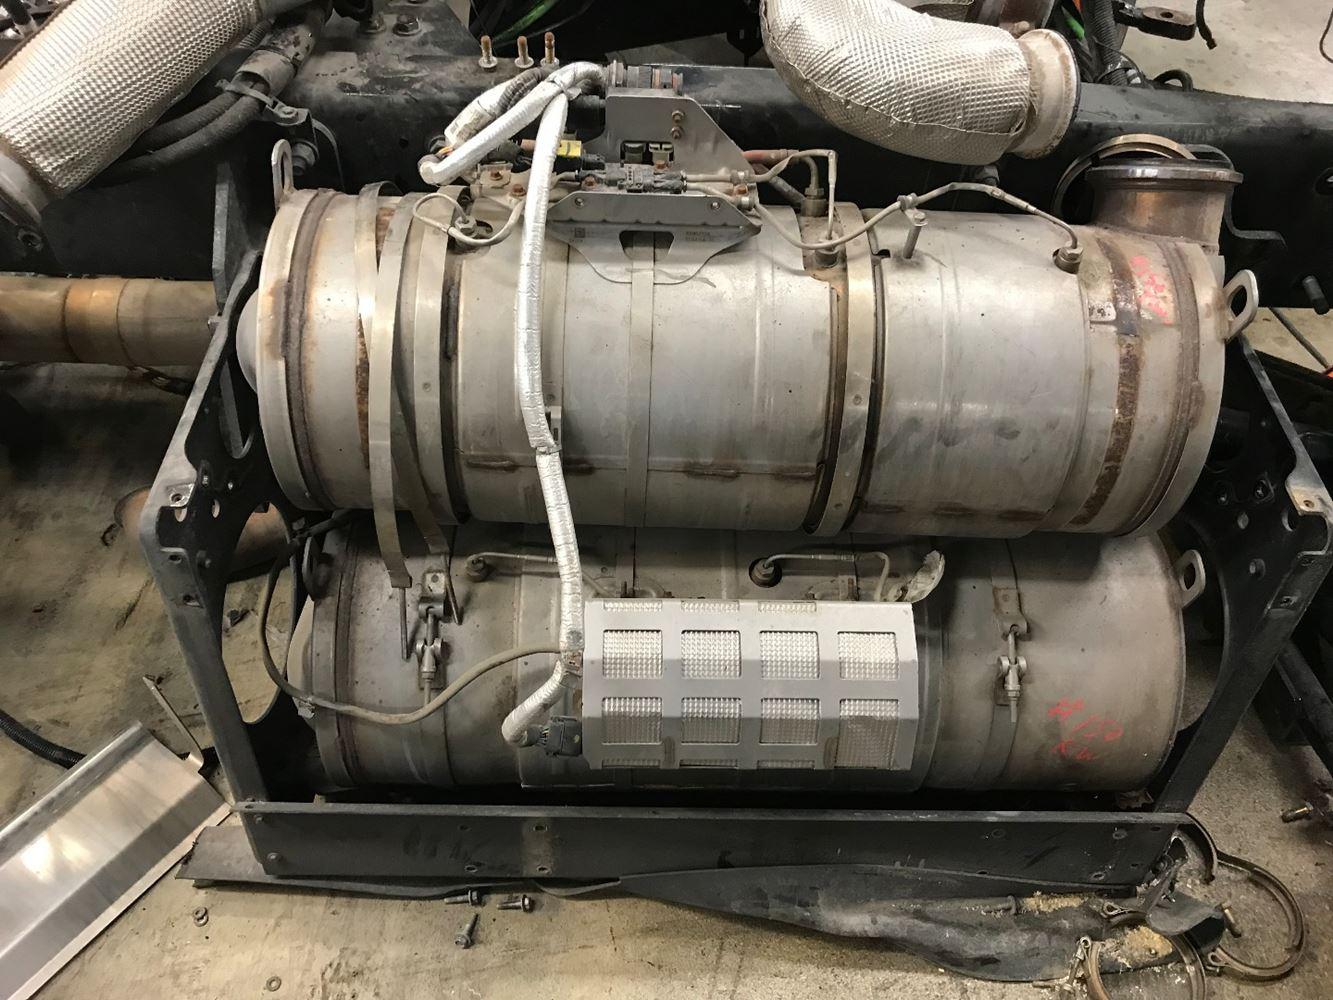 Kenworth T680 For Sale >> 2016 Kenworth T680 (Stock #SV-101-4) | Diesel Particulate Filter (DPF) | TPI